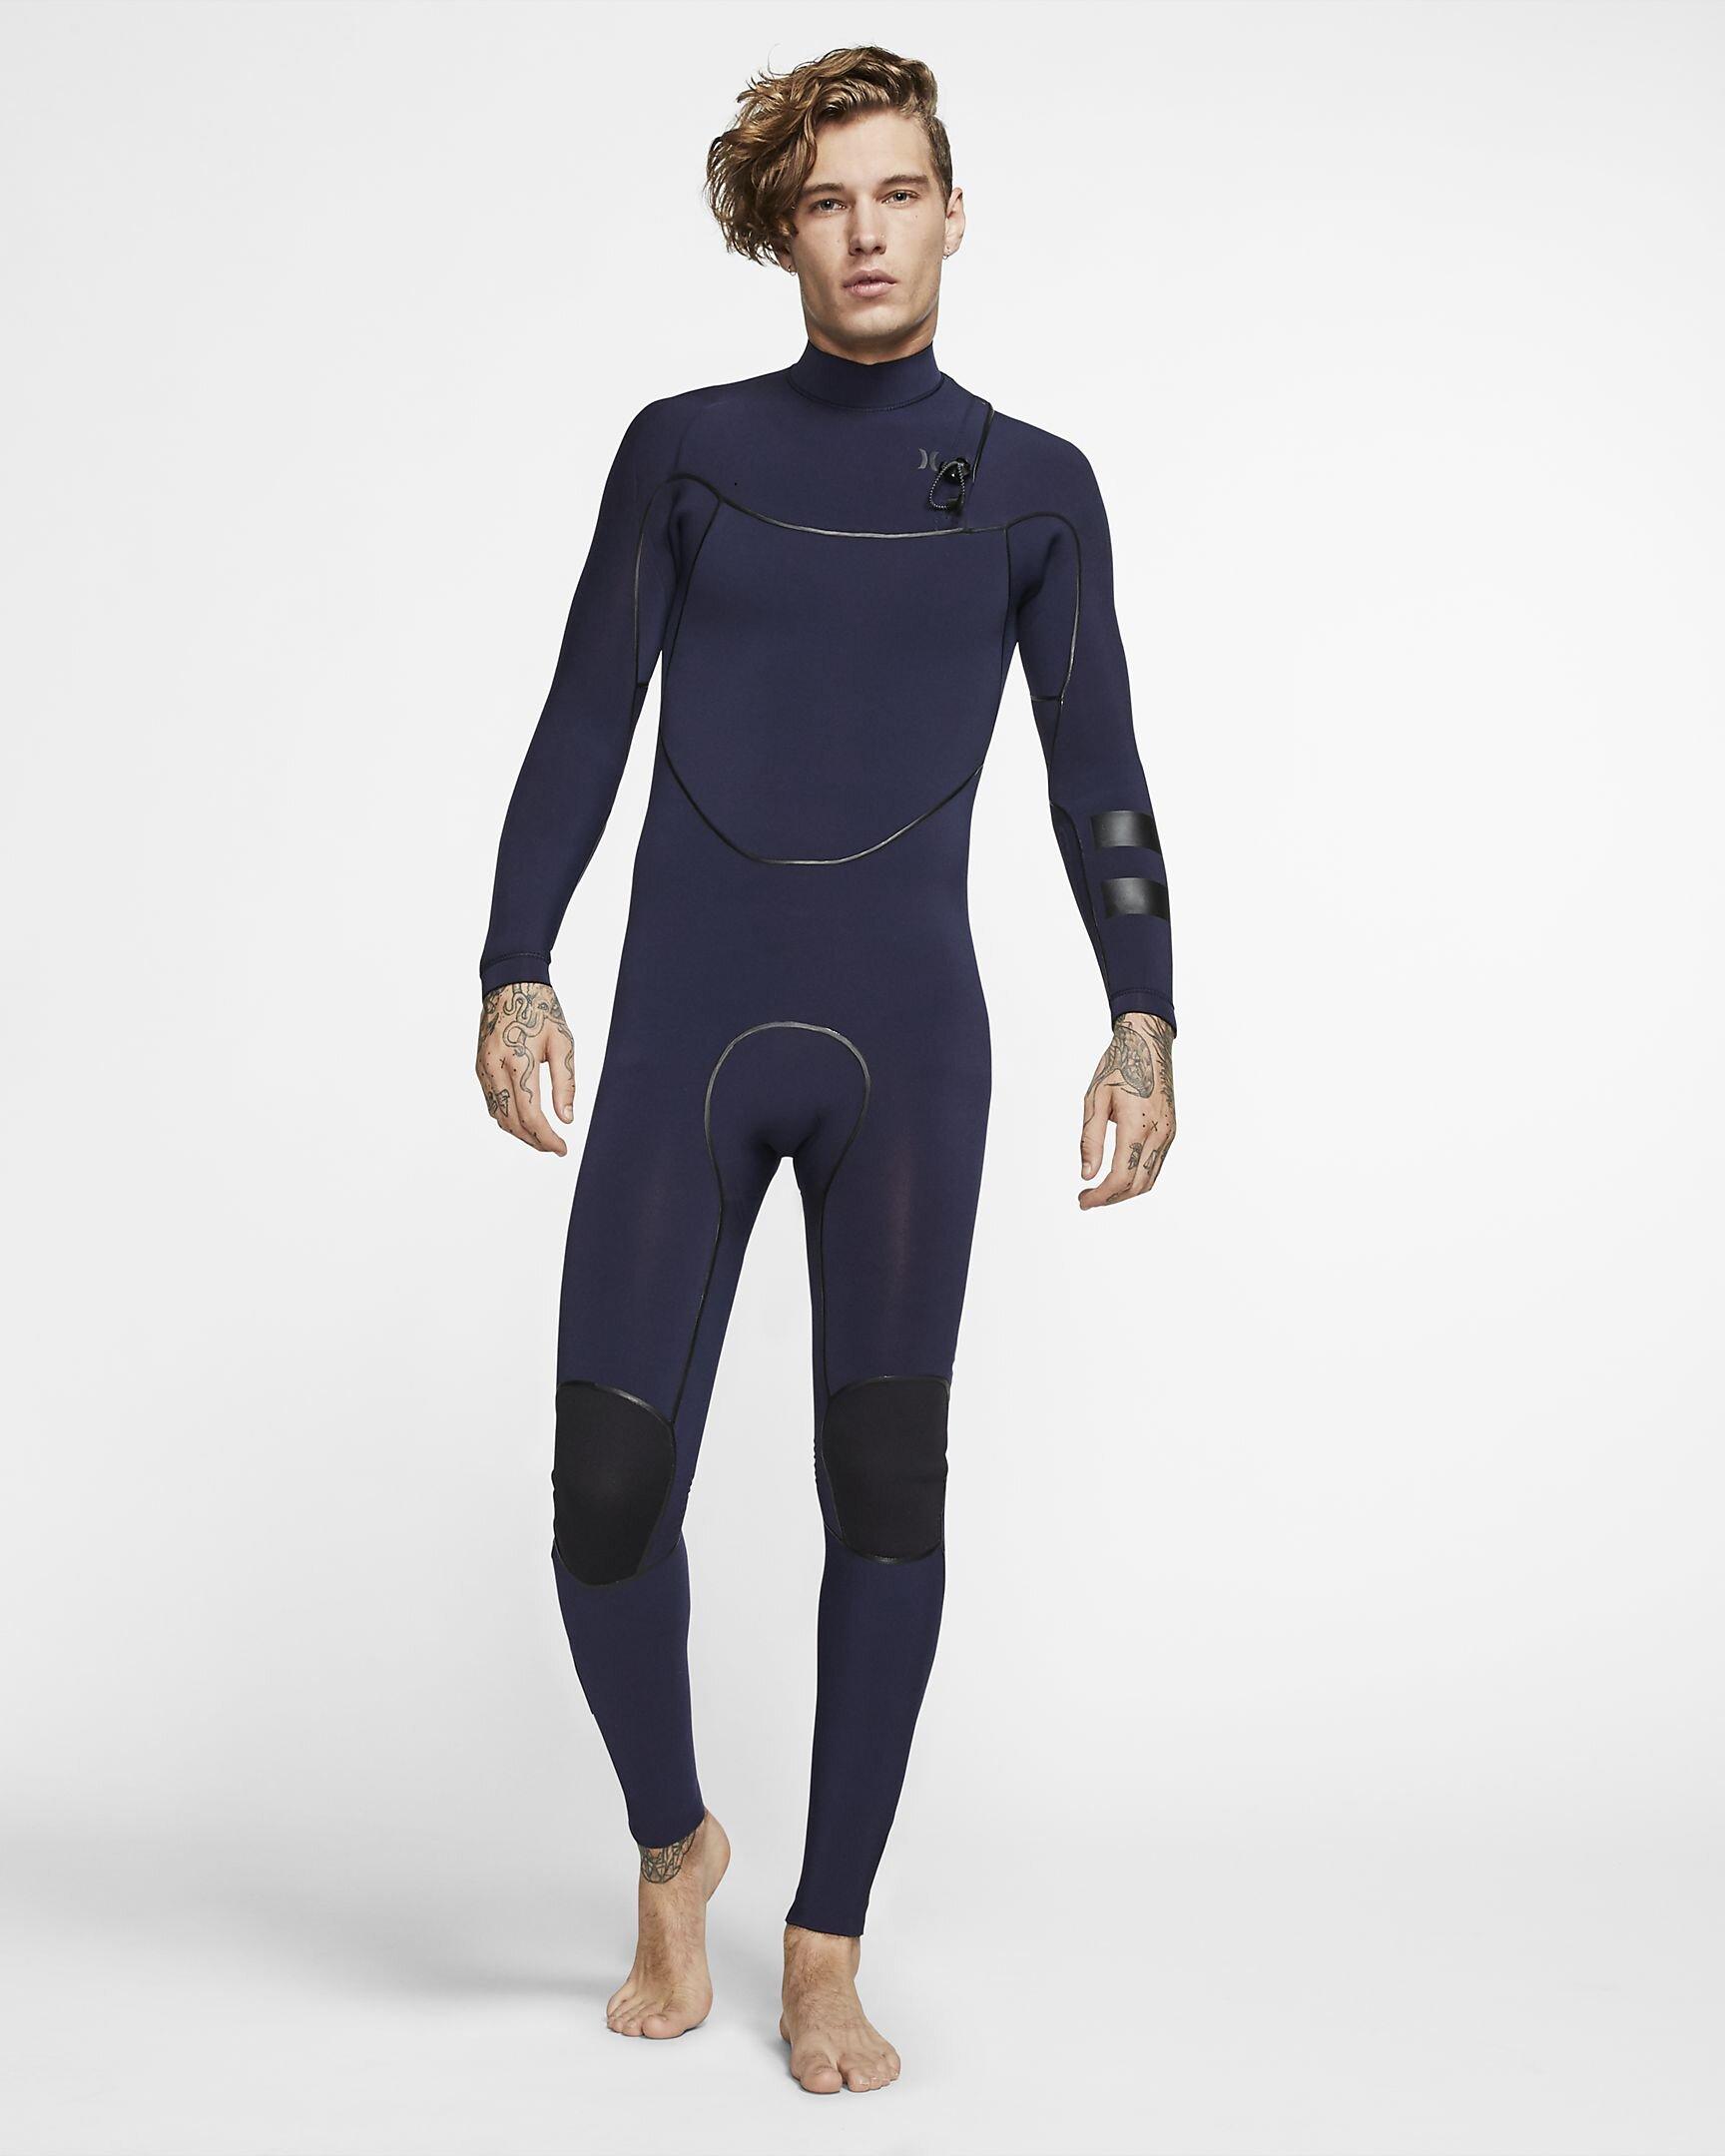 hurley-advantage-max-4-3-fullsuit-mens-wetsuit-8ZN8gg.jpg